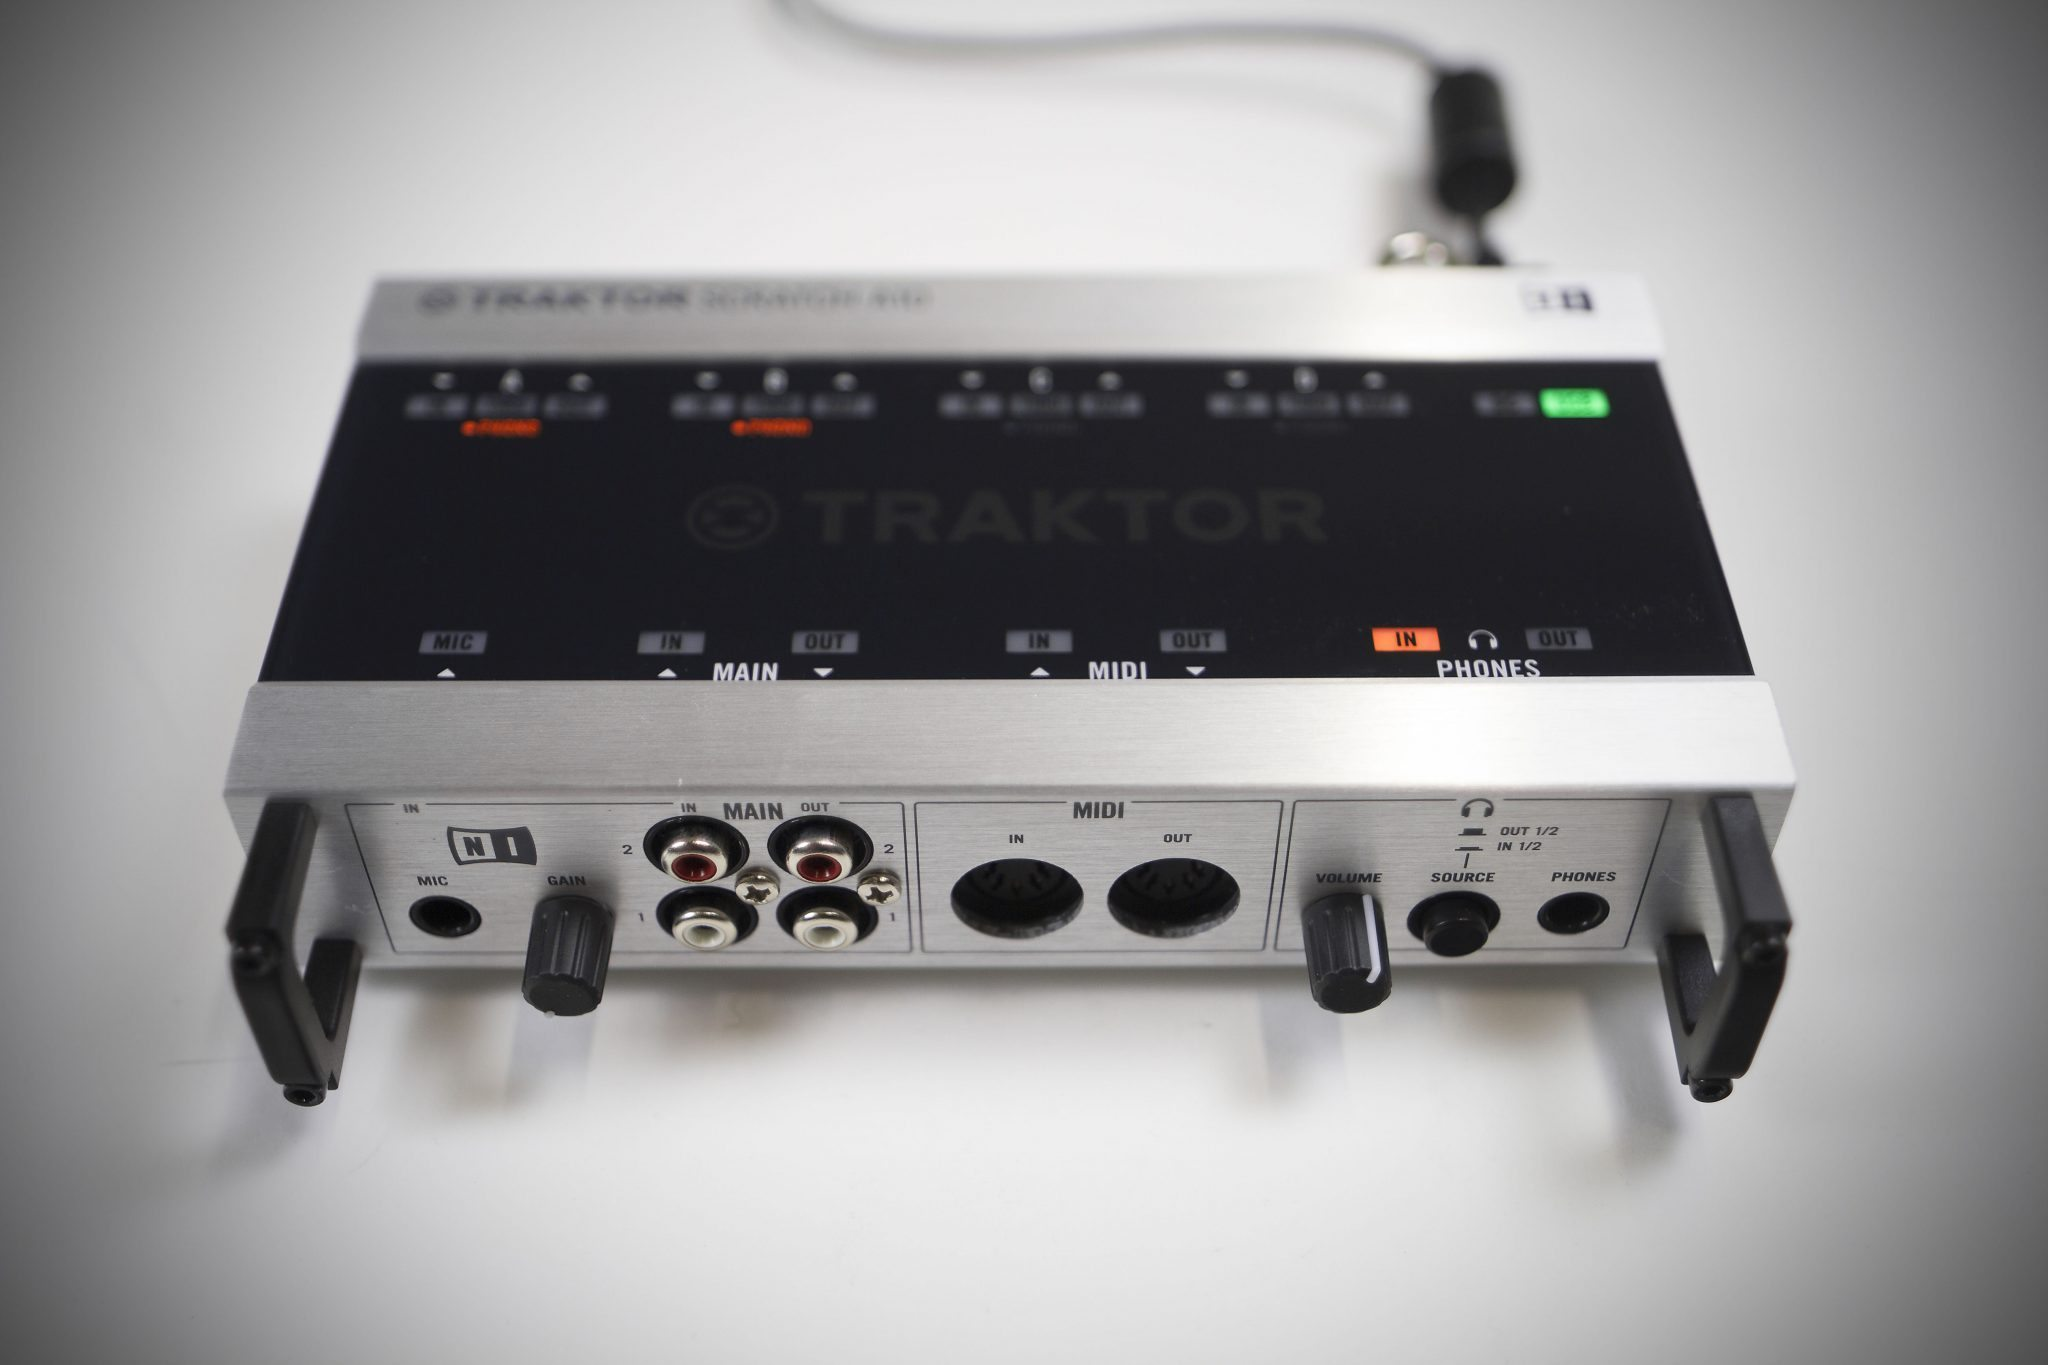 review ni traktor scratch a10 mk2 audio interface djworx. Black Bedroom Furniture Sets. Home Design Ideas